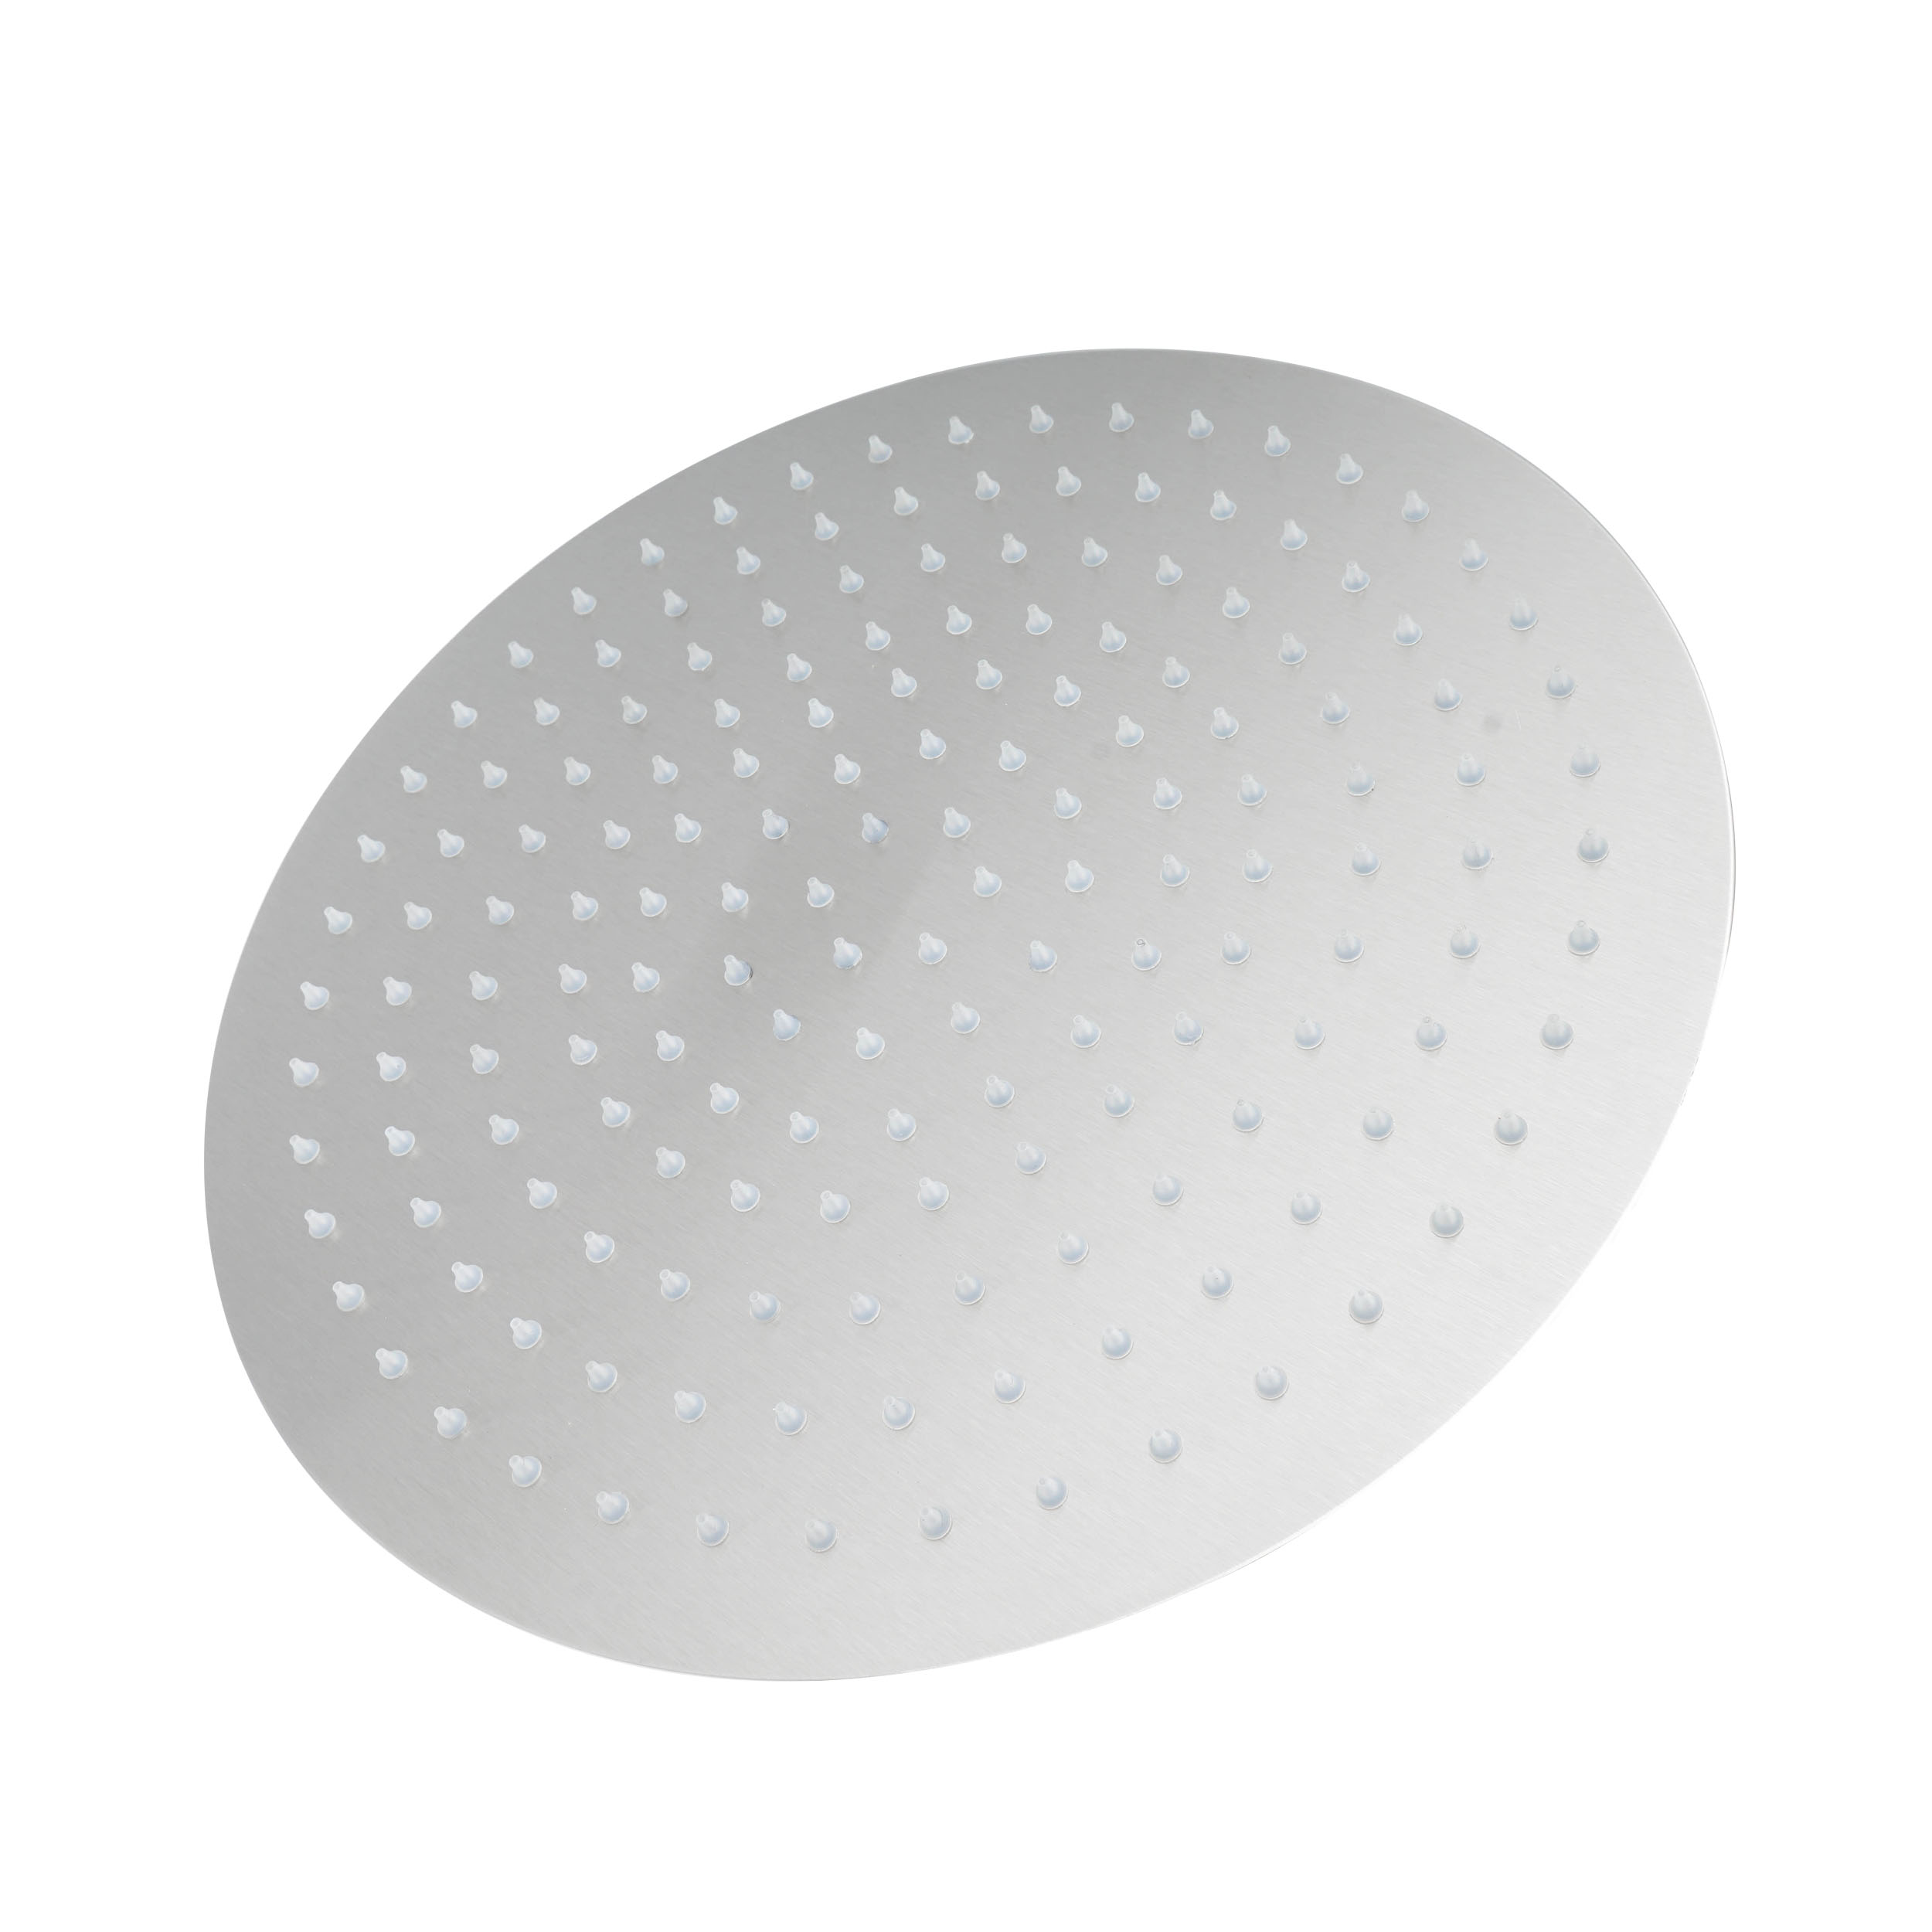 Boann Stainless Round Rain Shower Head 12 Brushed Nickel